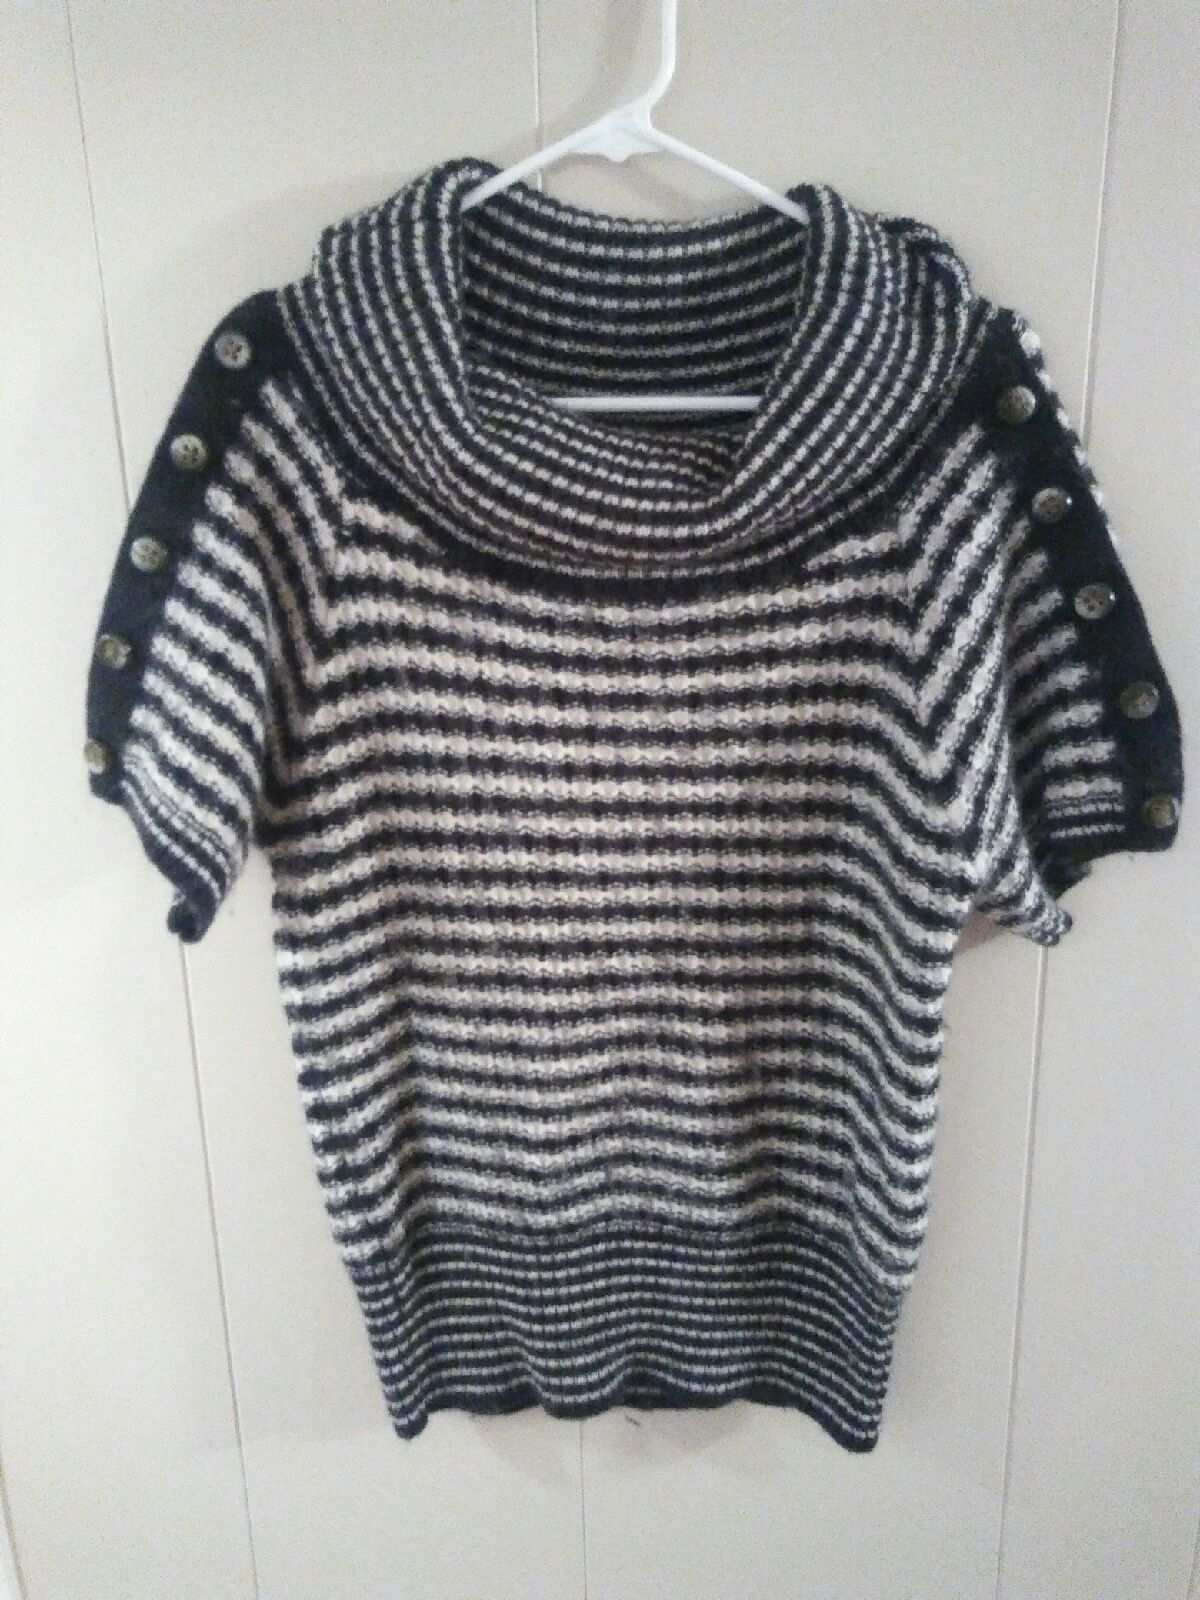 Striped cowl neck sweater sz medium - Mercari: BUY & SELL THINGS ...